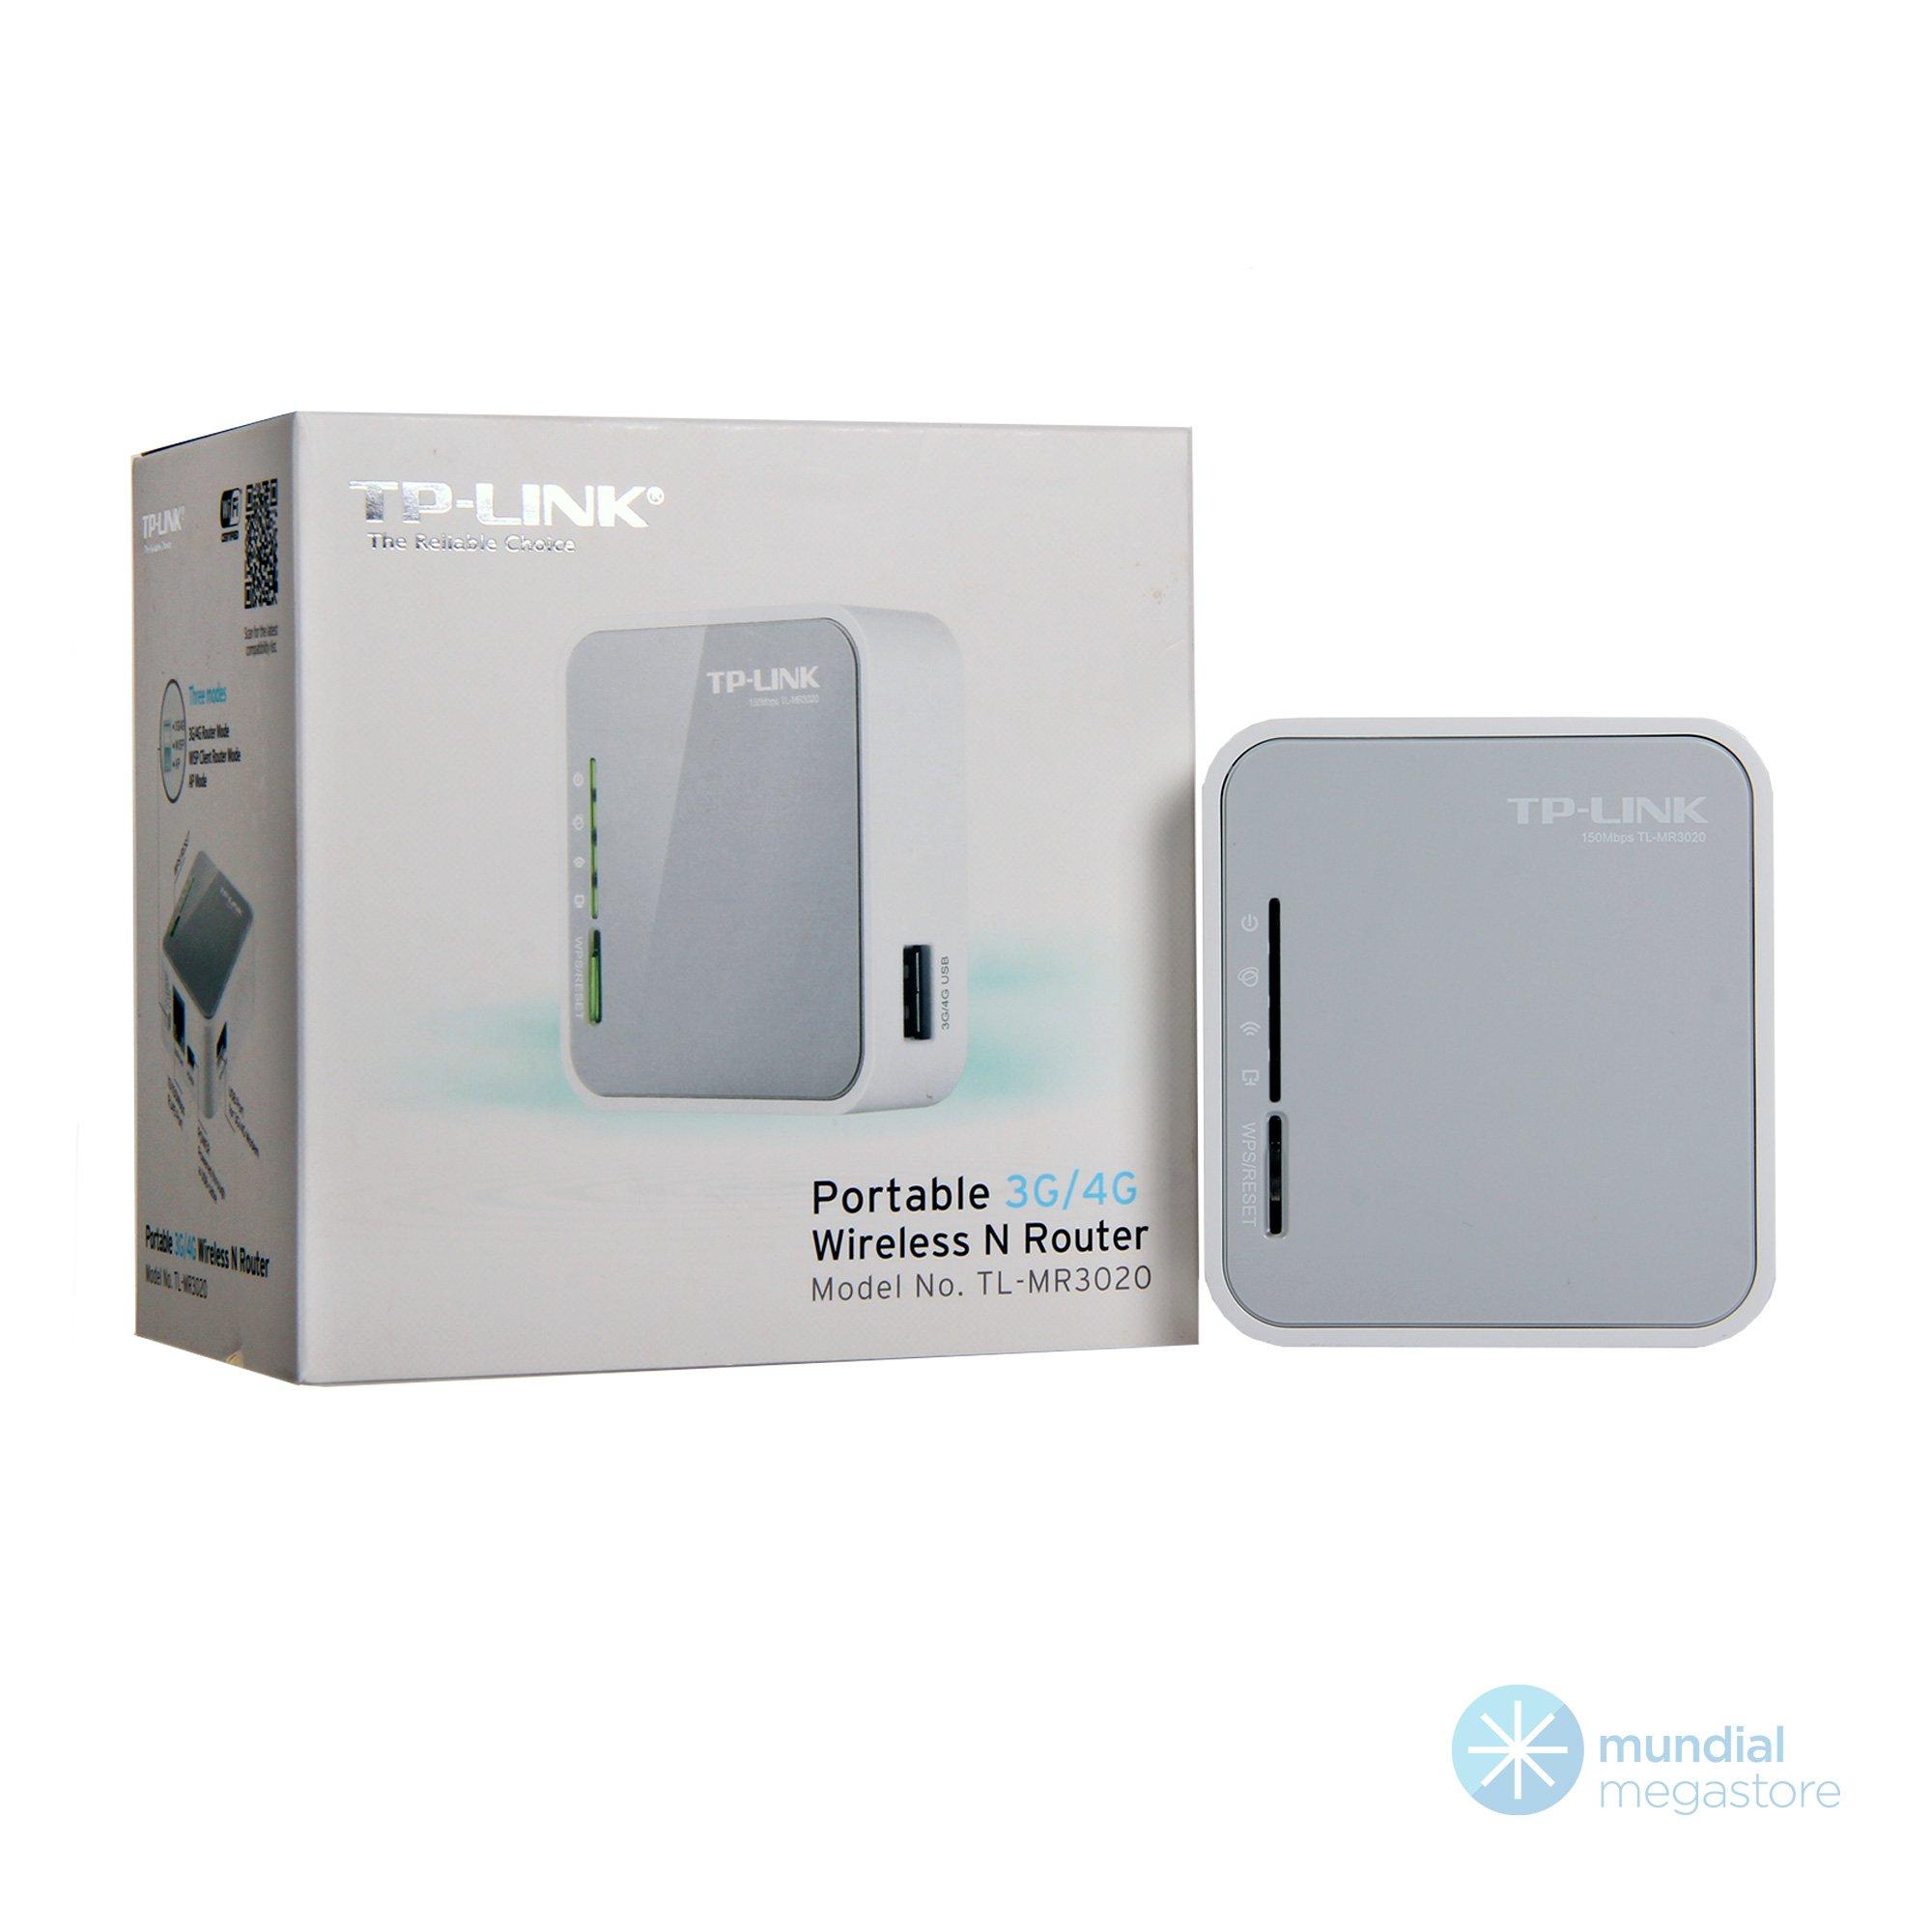 wireless mini roteador portatil 3g 4g tp link tl mr3020 150mbps 45095 2000 195973